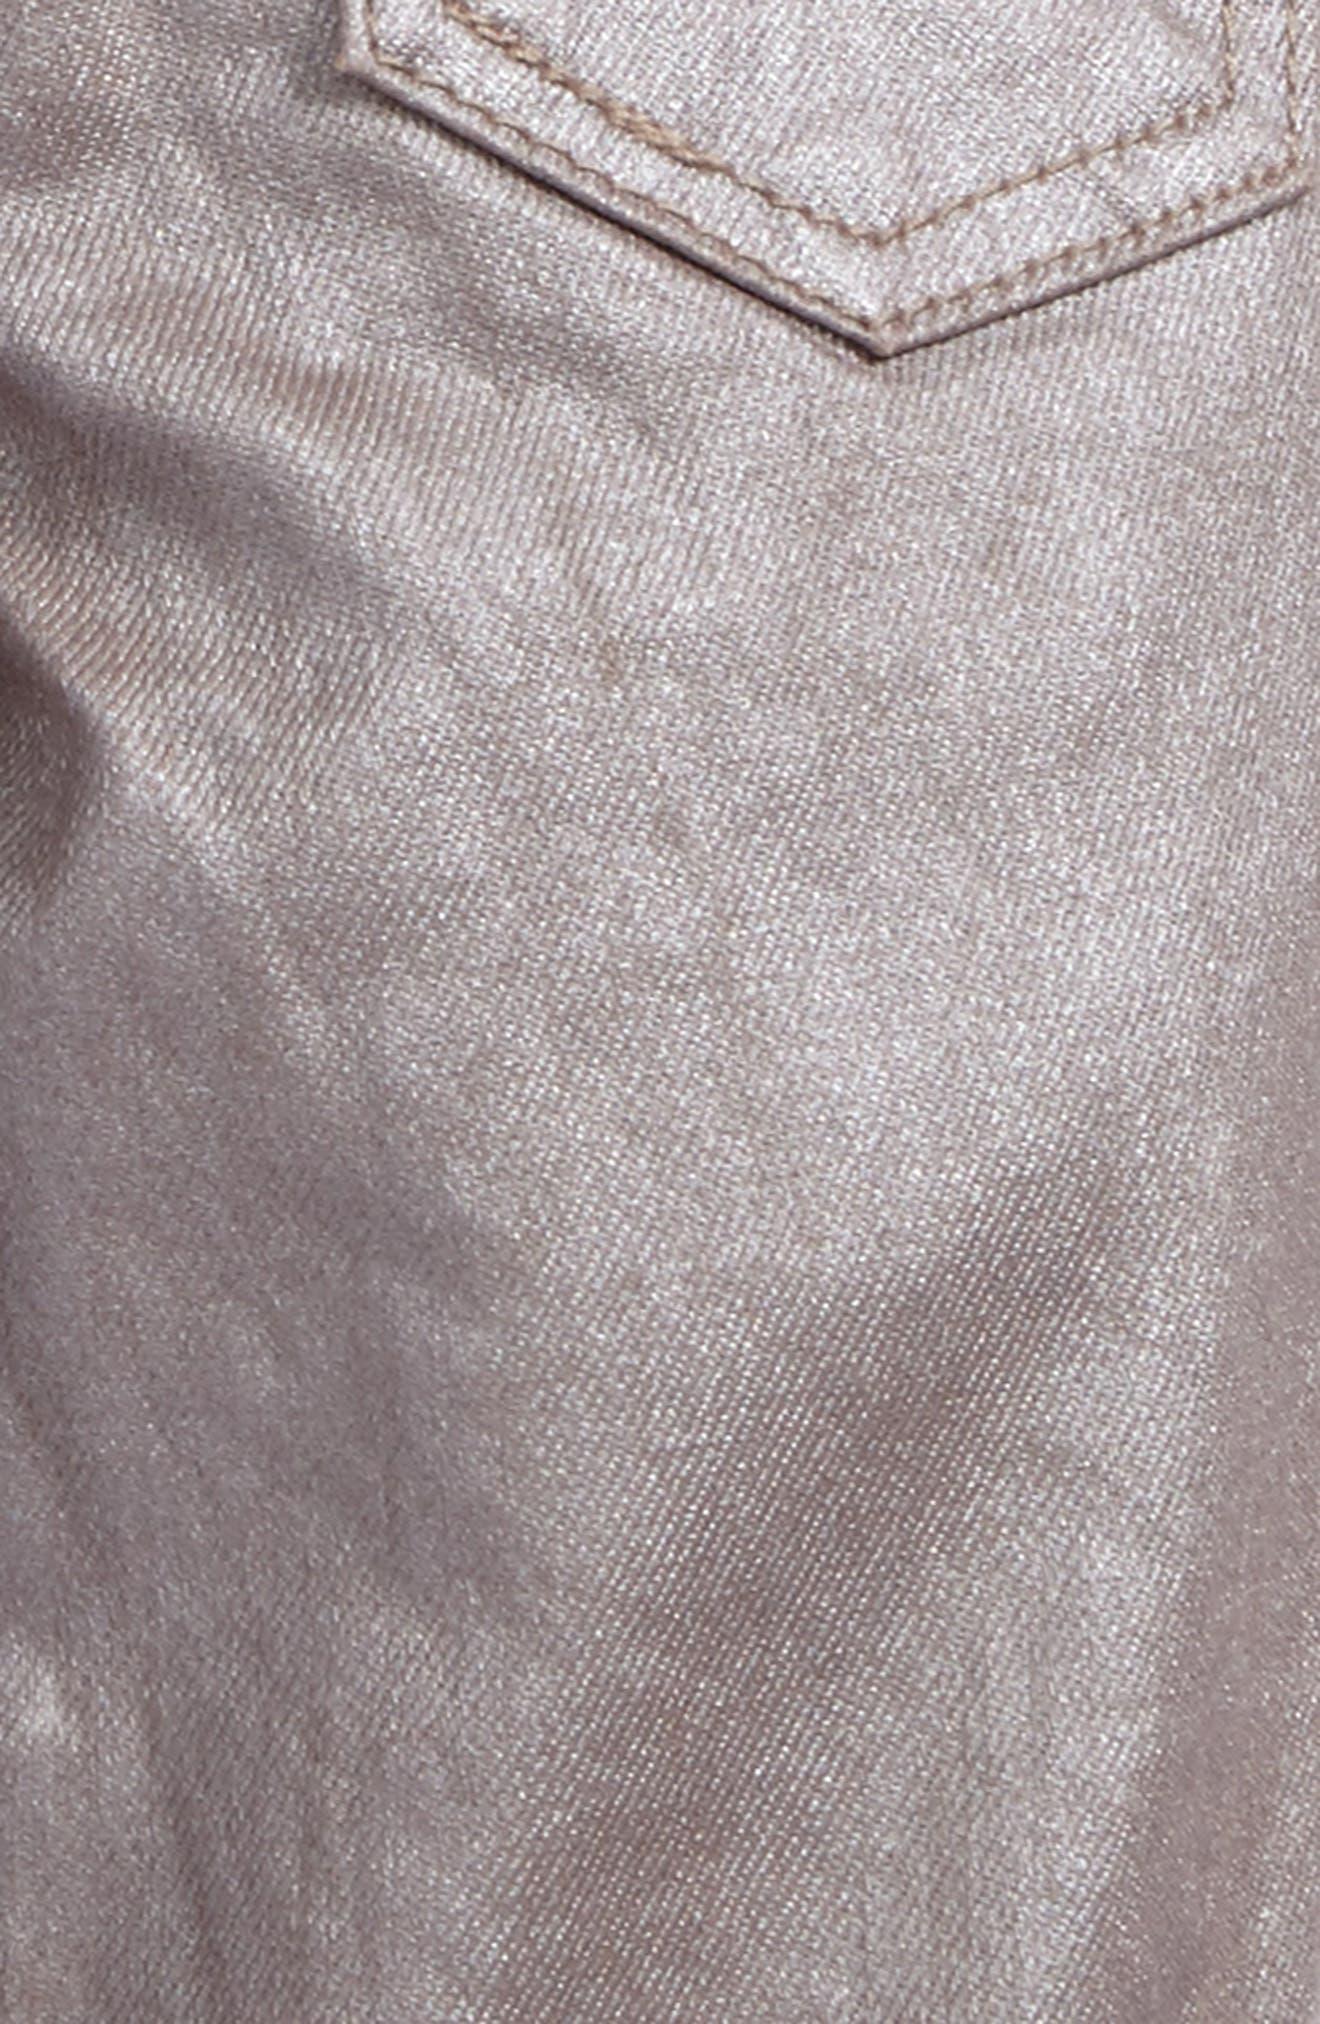 Alternate Image 3  - ag adriano goldschmied kids The Sleek Twiggy Super Skinny Jeans (Baby Girls)